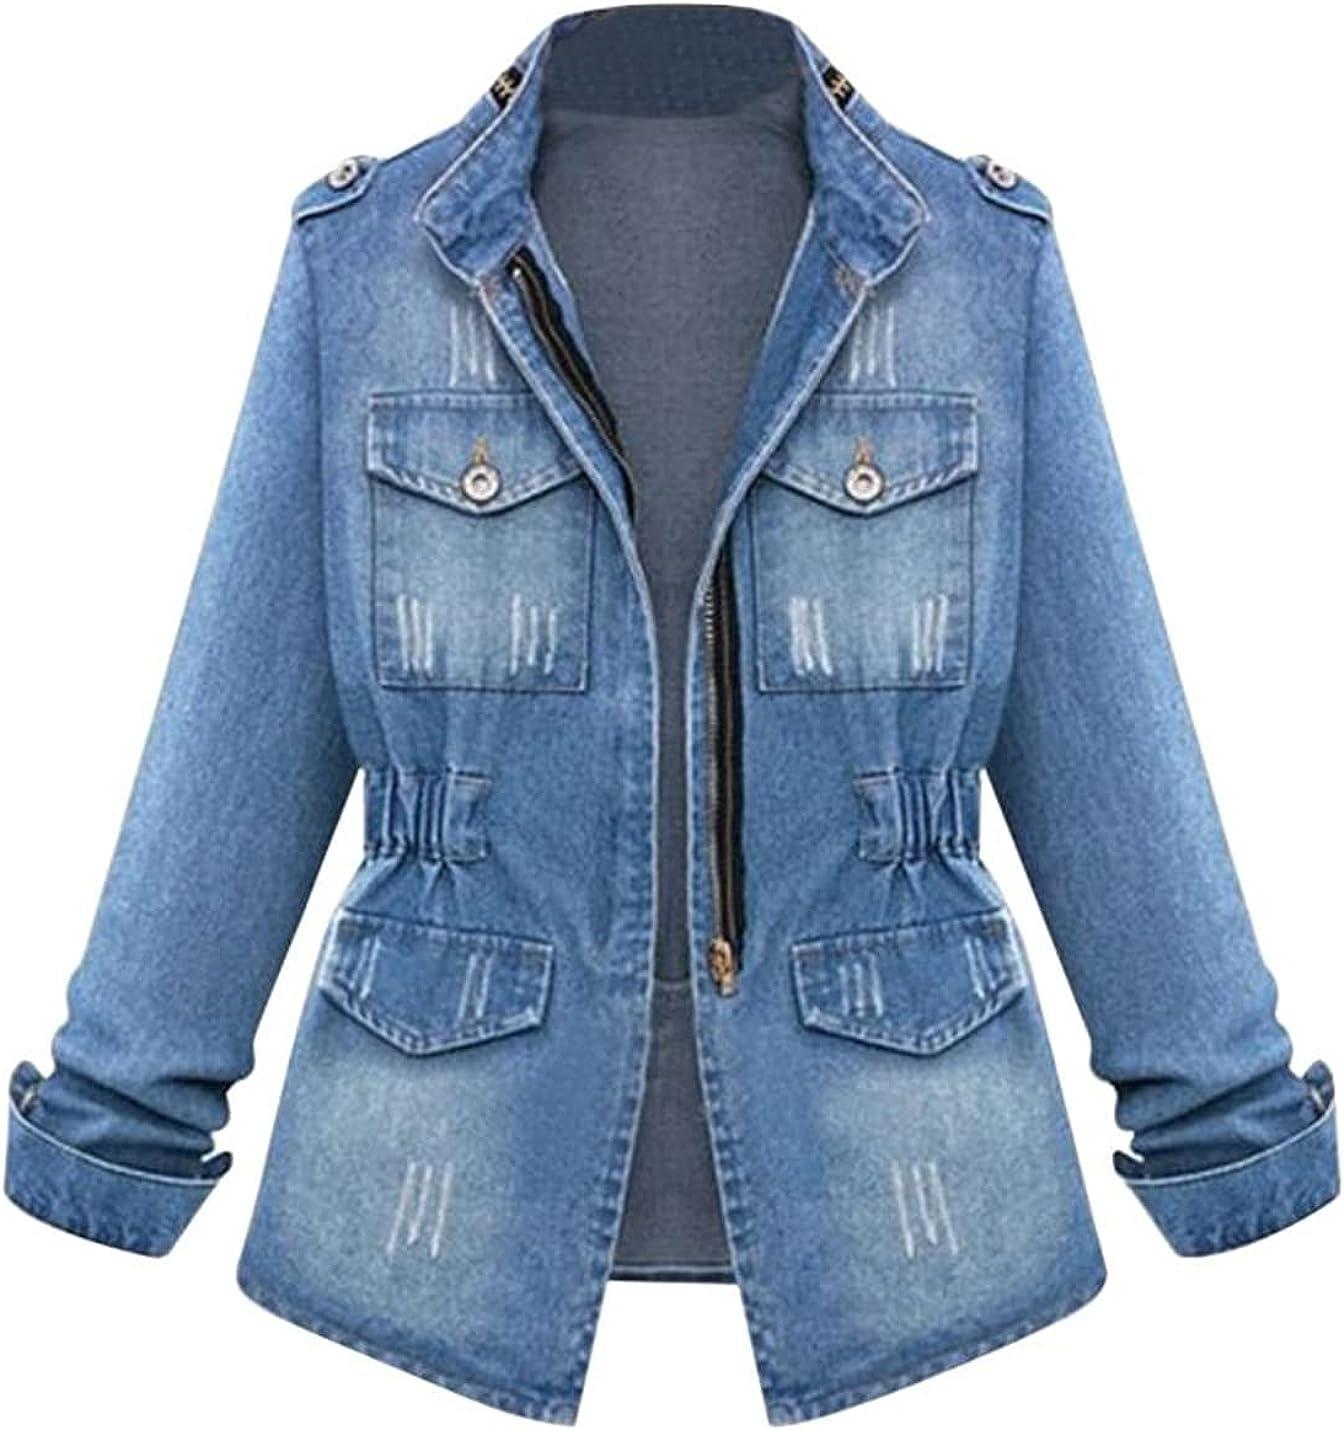 Peaceglad Womens Oversized Long Sleeve Zip Ripped Denim Jacket Casual Tunic Tops